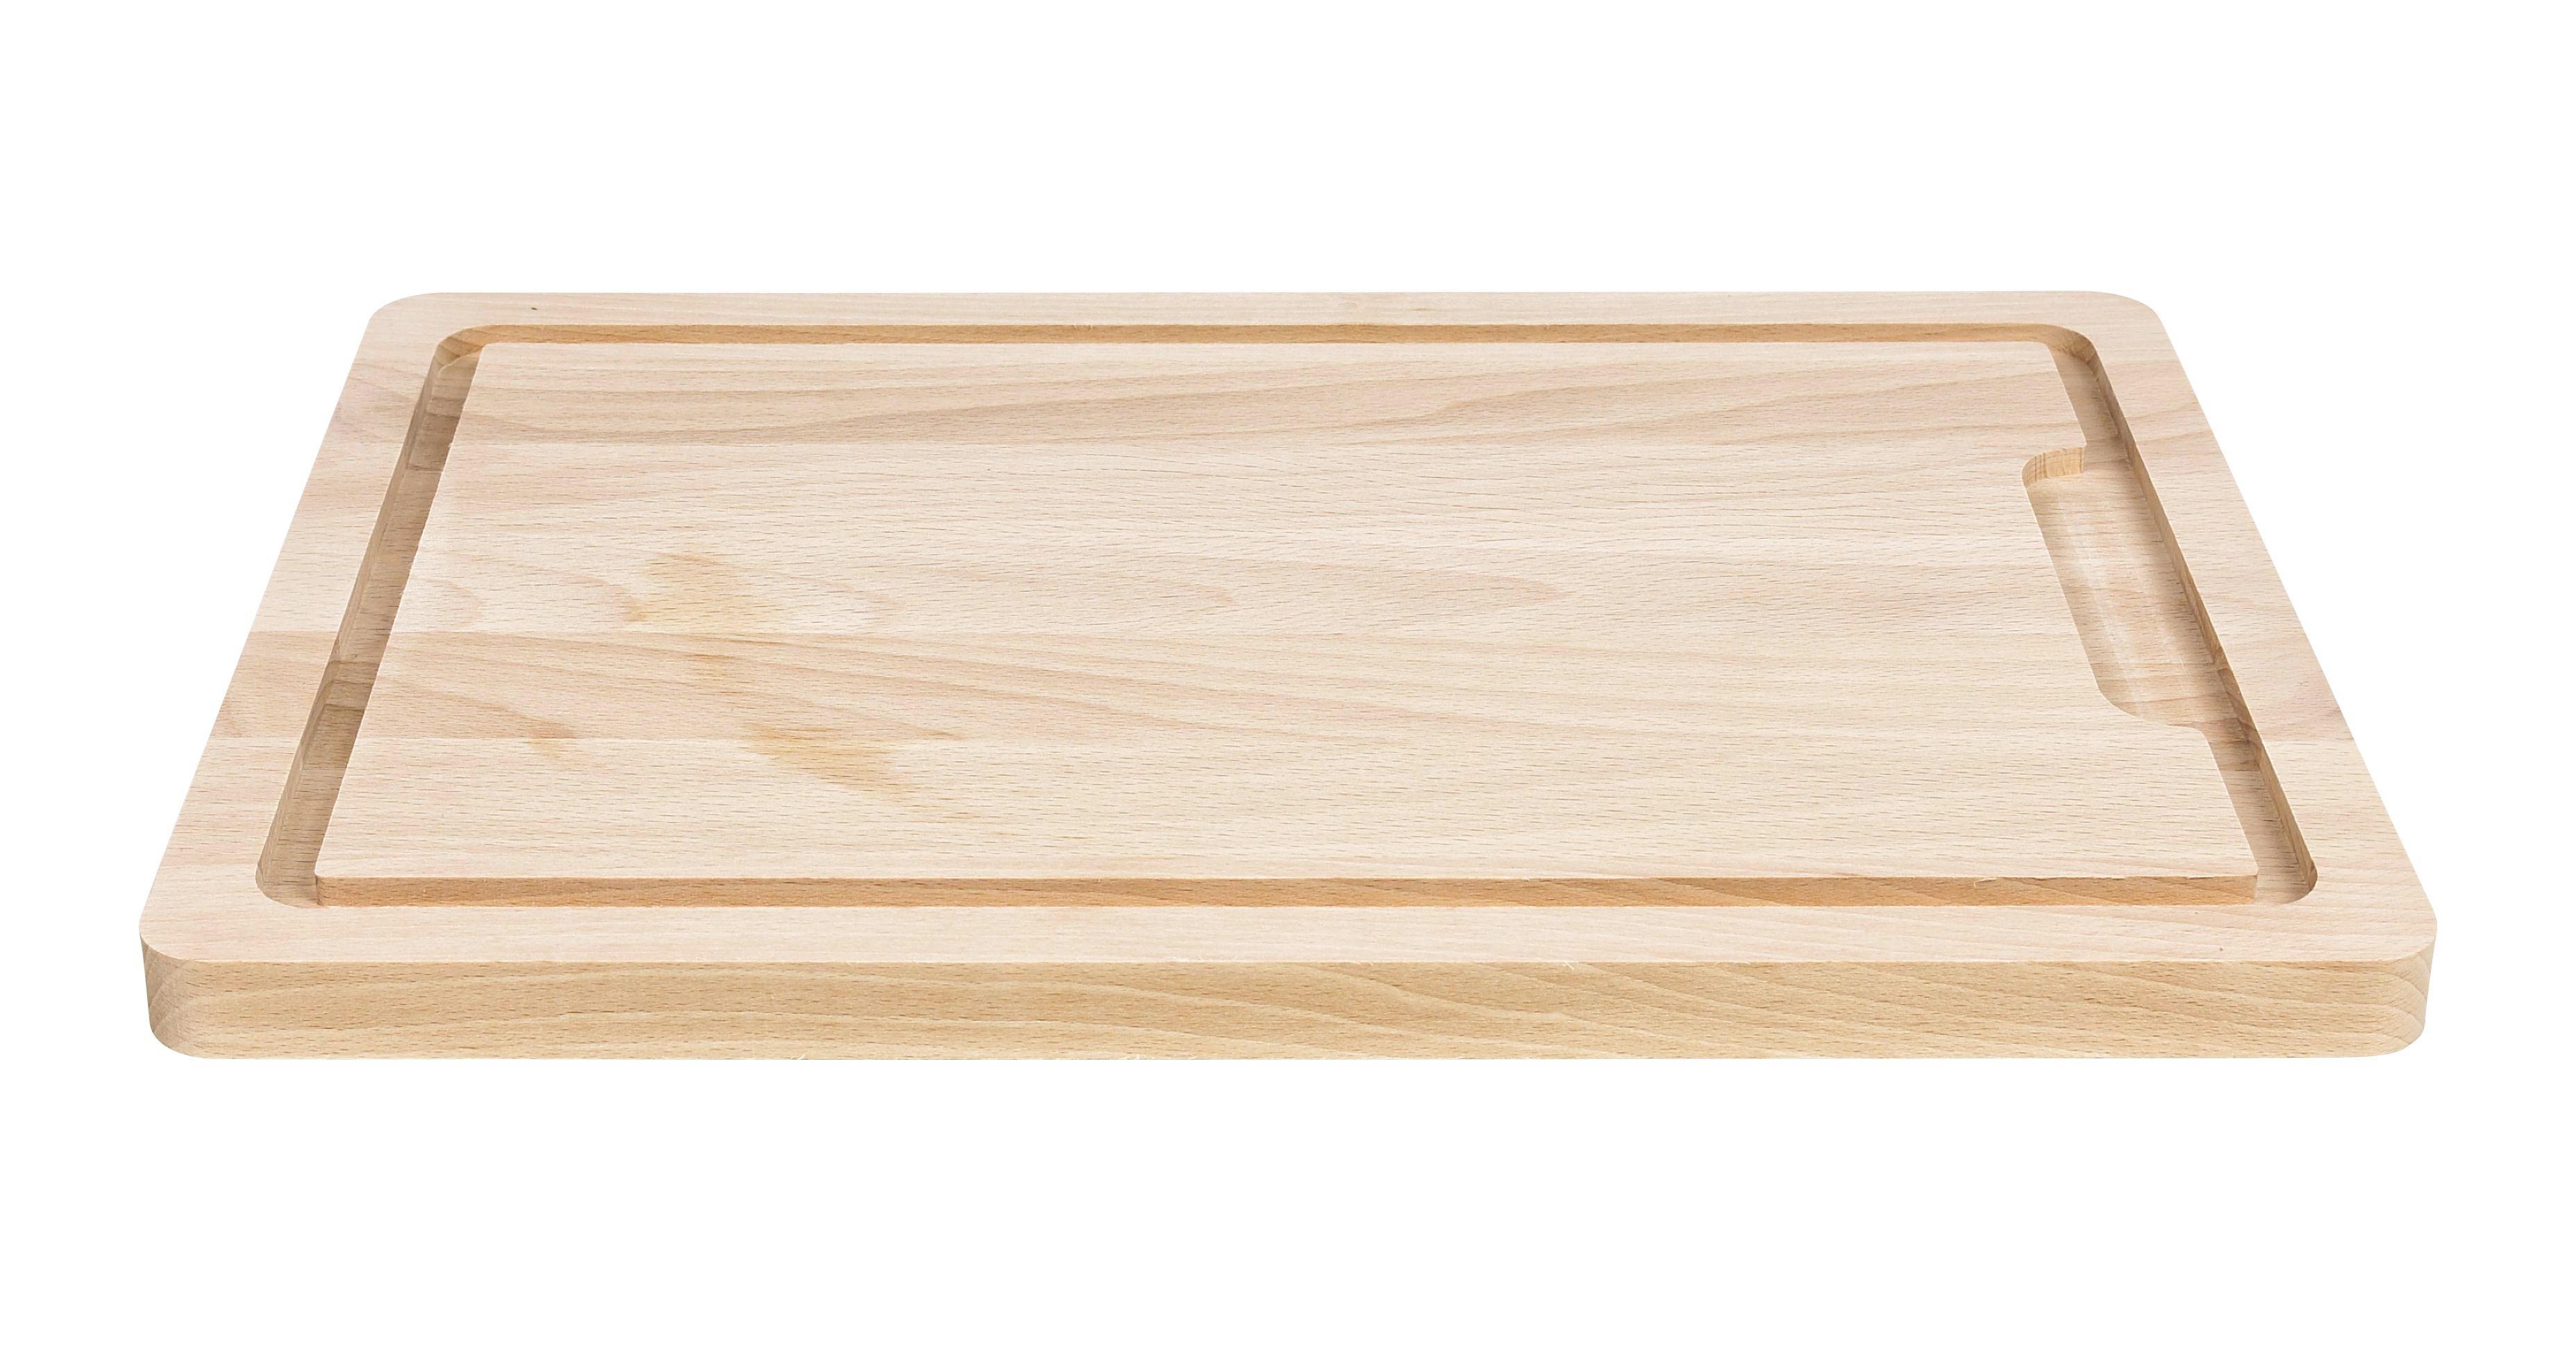 SCHNEIDEBRETT 40/28/12 cm - Braun, Basics, Holz (40/28/12cm) - HOMEWARE